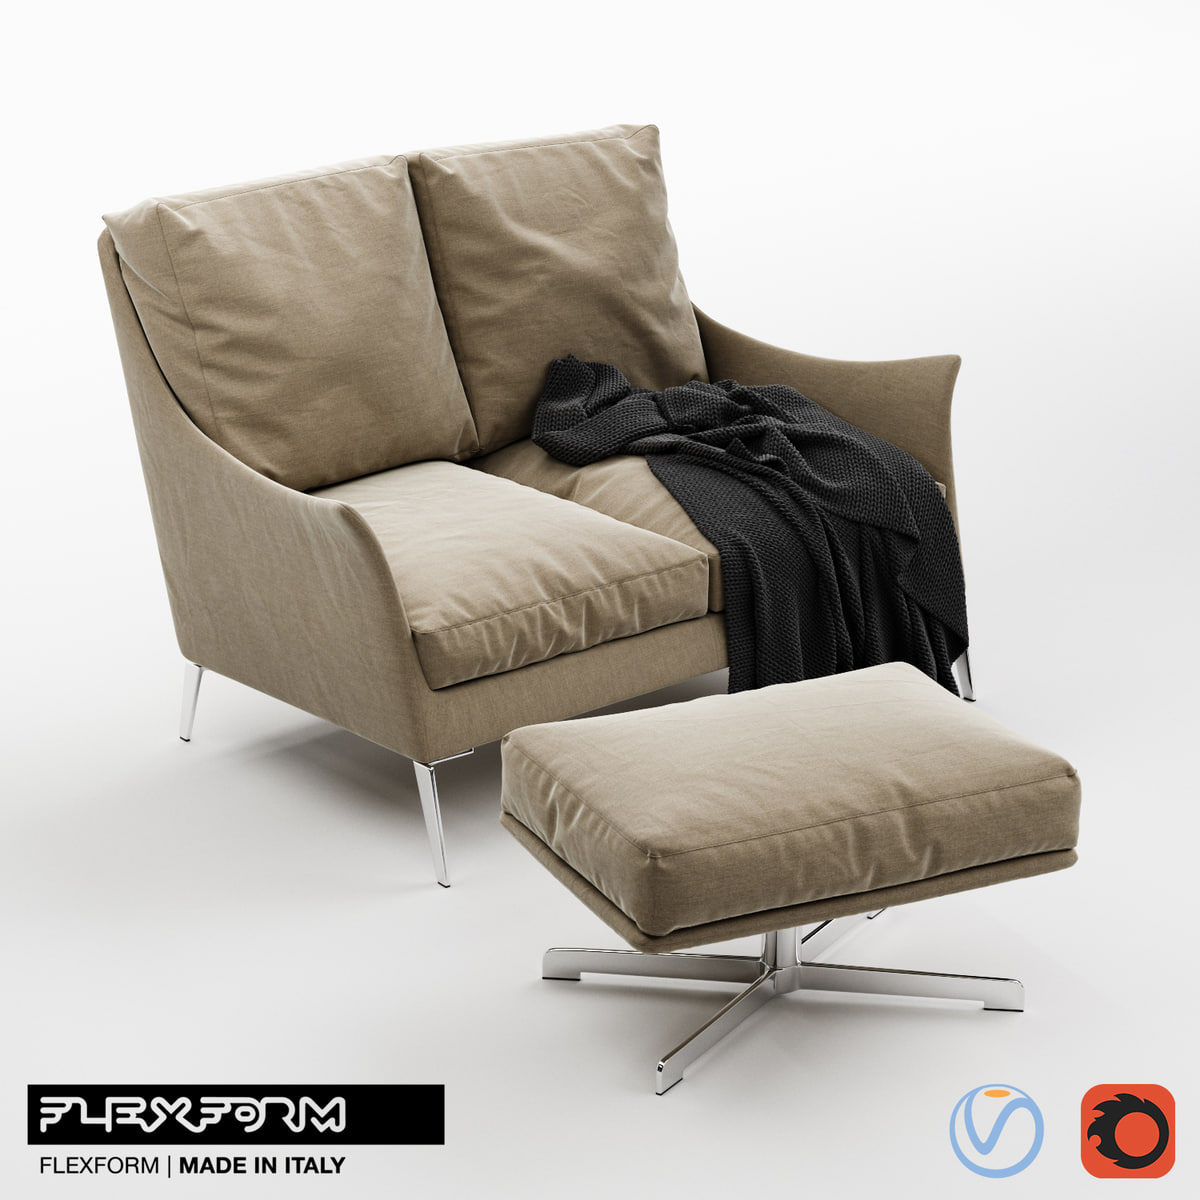 flexform boss sofa pouf 3D model